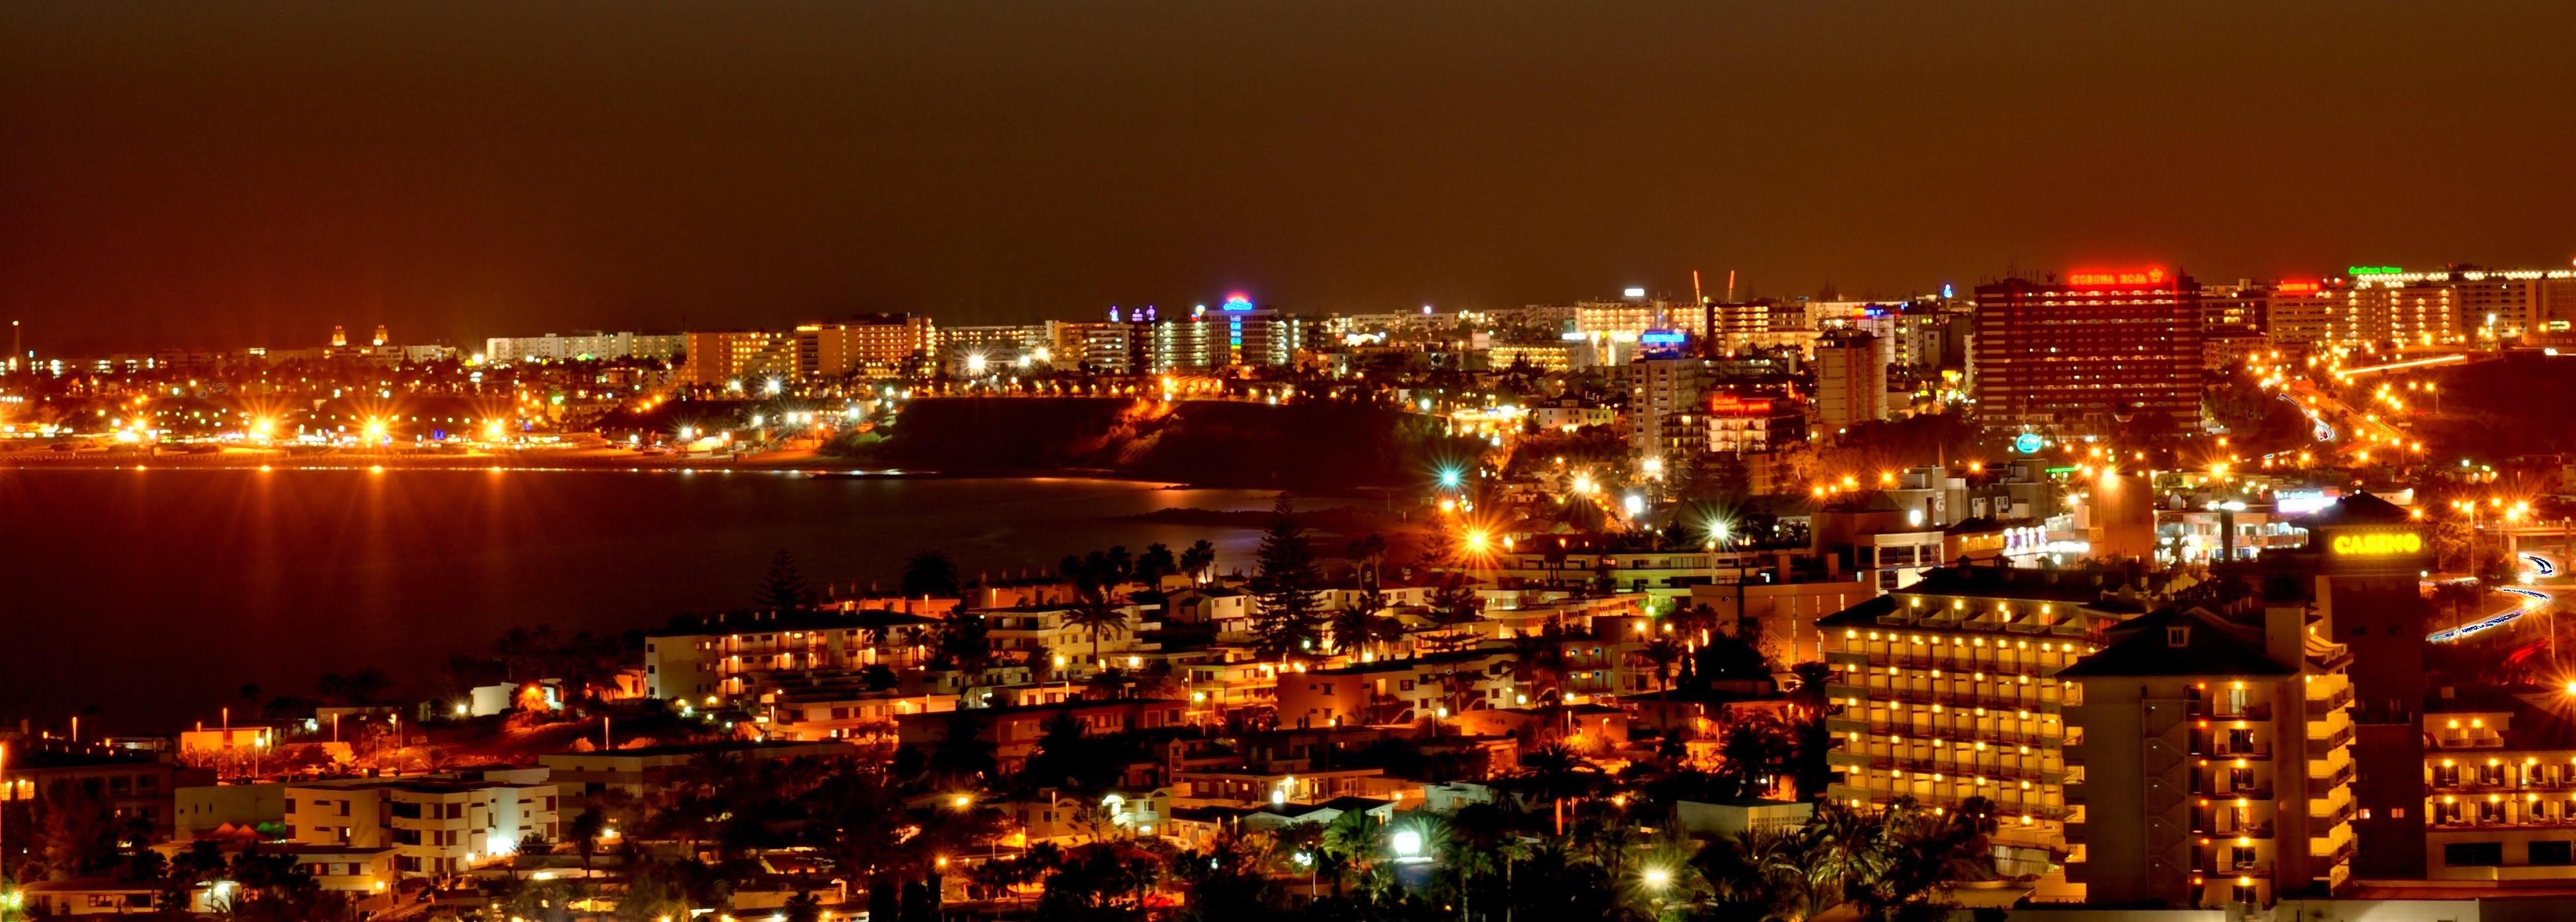 Noche en Playa del Inglés